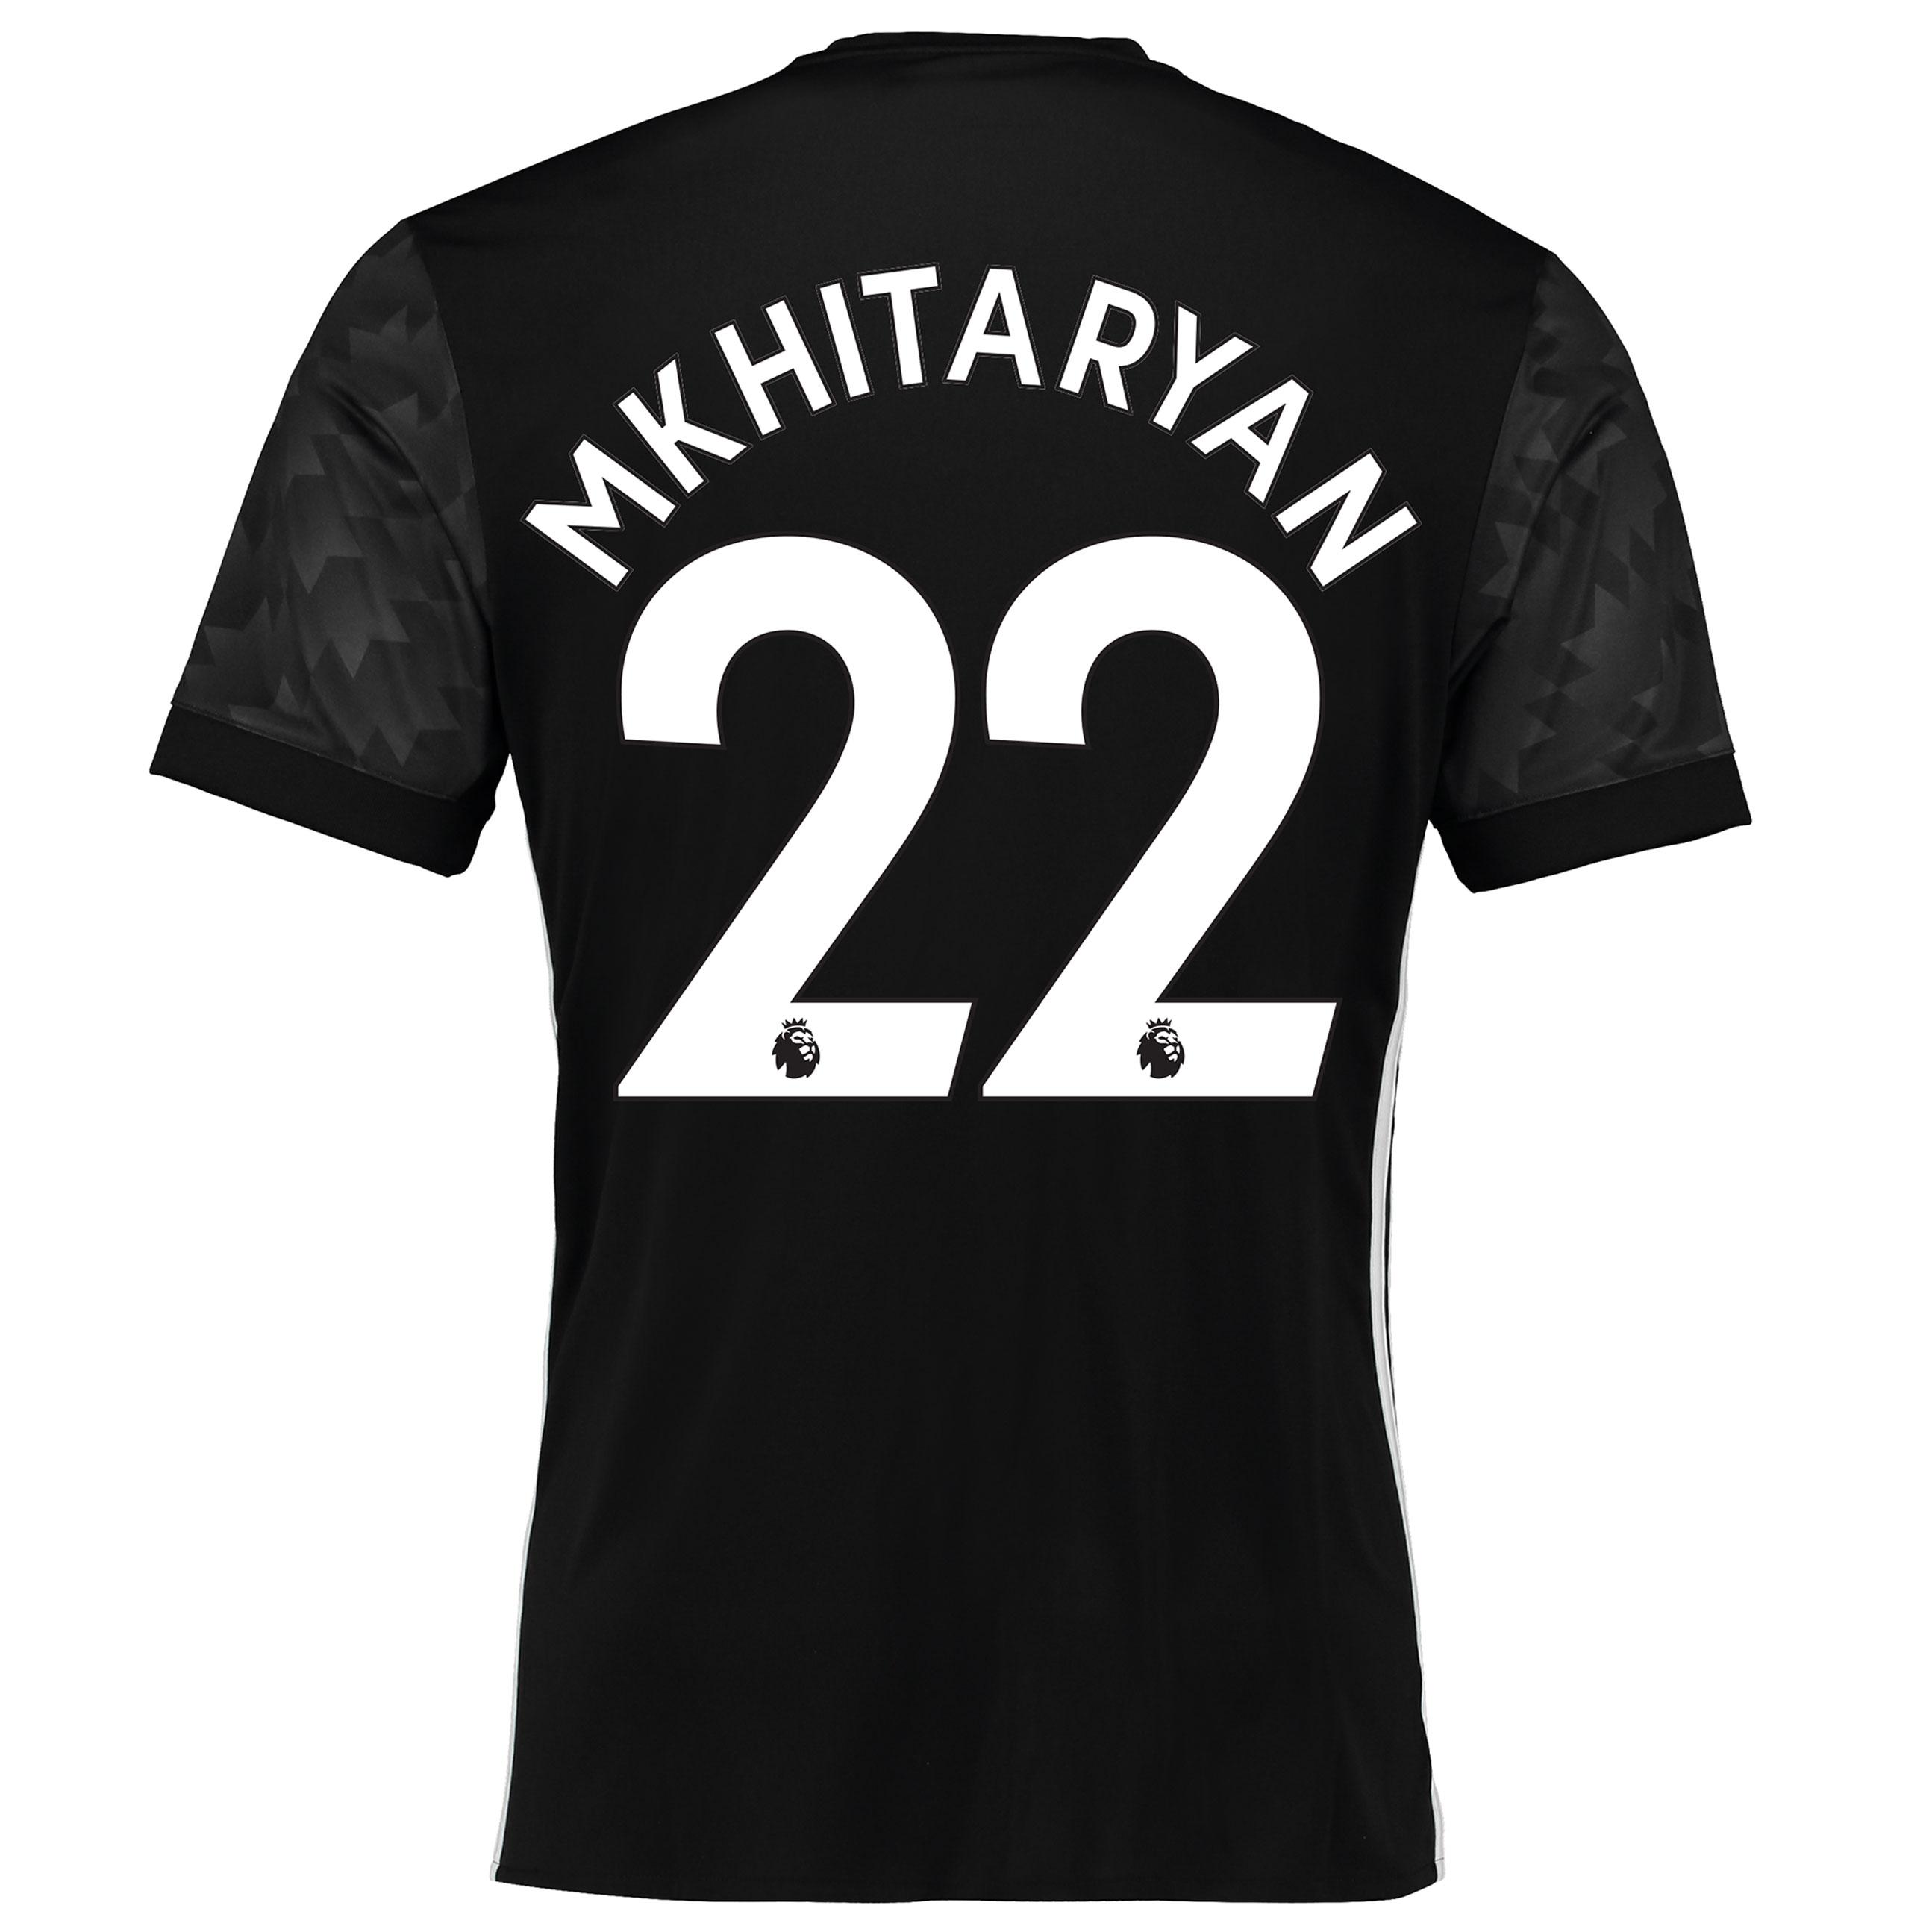 Manchester United Away Shirt 2017-18 with Mkhitaryan 22 printing